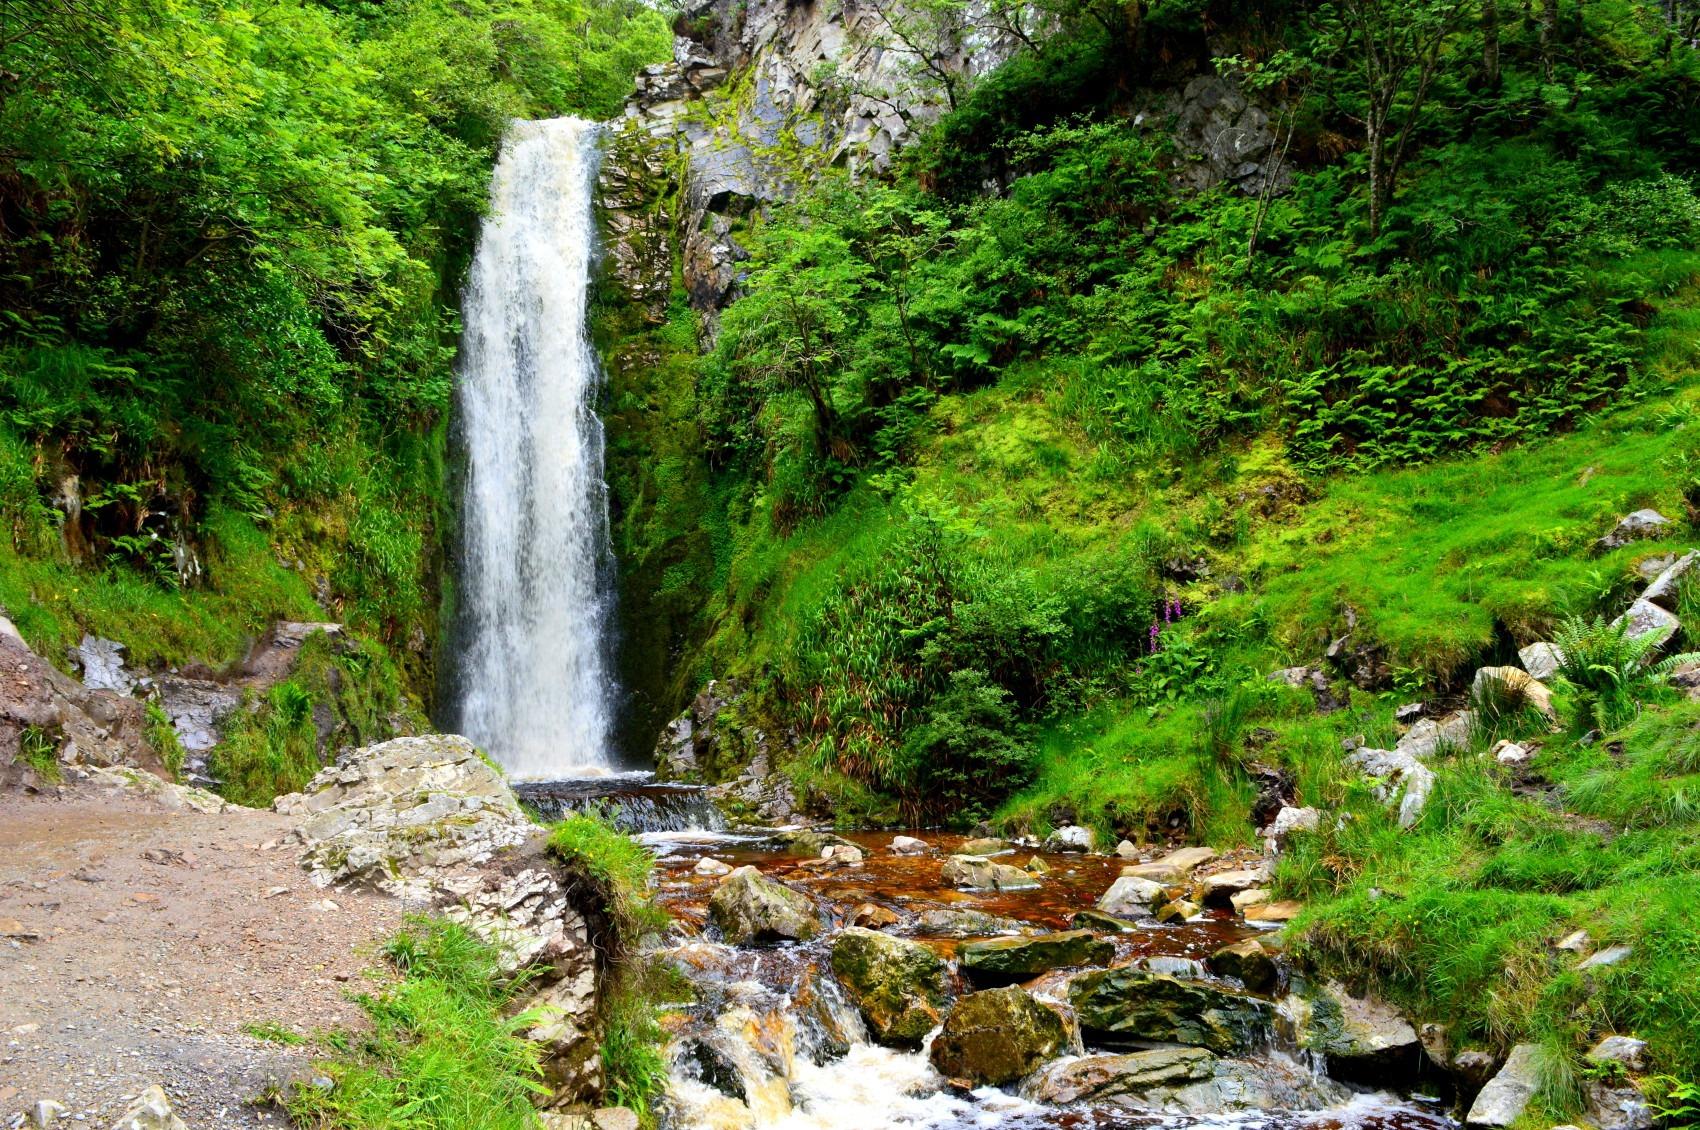 Clonmany waterfall gee